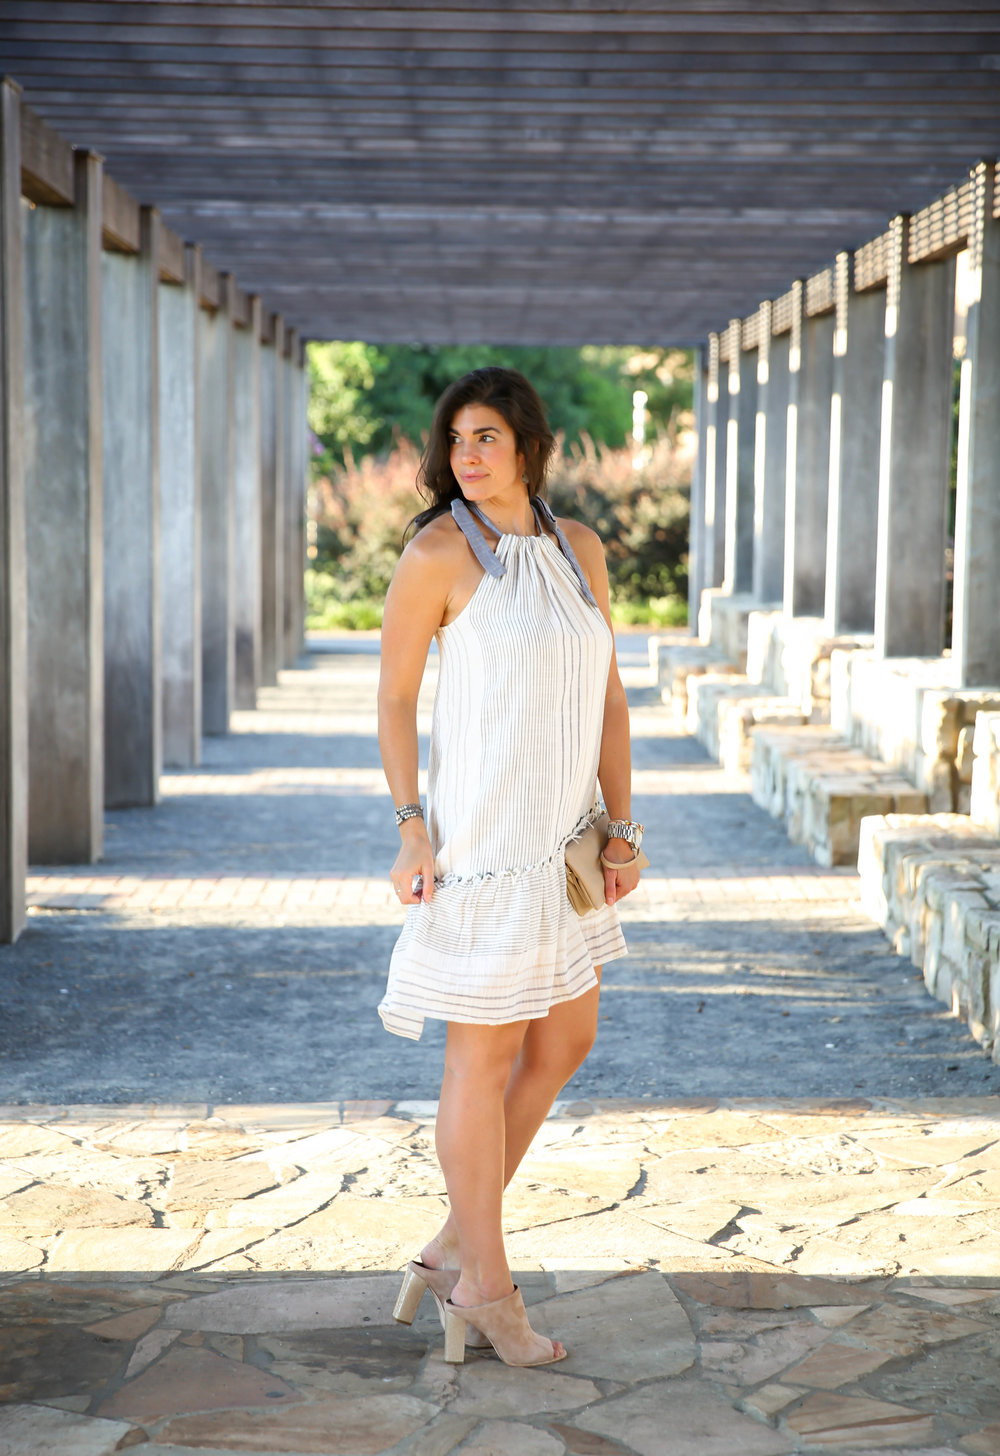 summer-chic-shoulder-tie-dress-lauren-schwaiger-style-blog.jpg